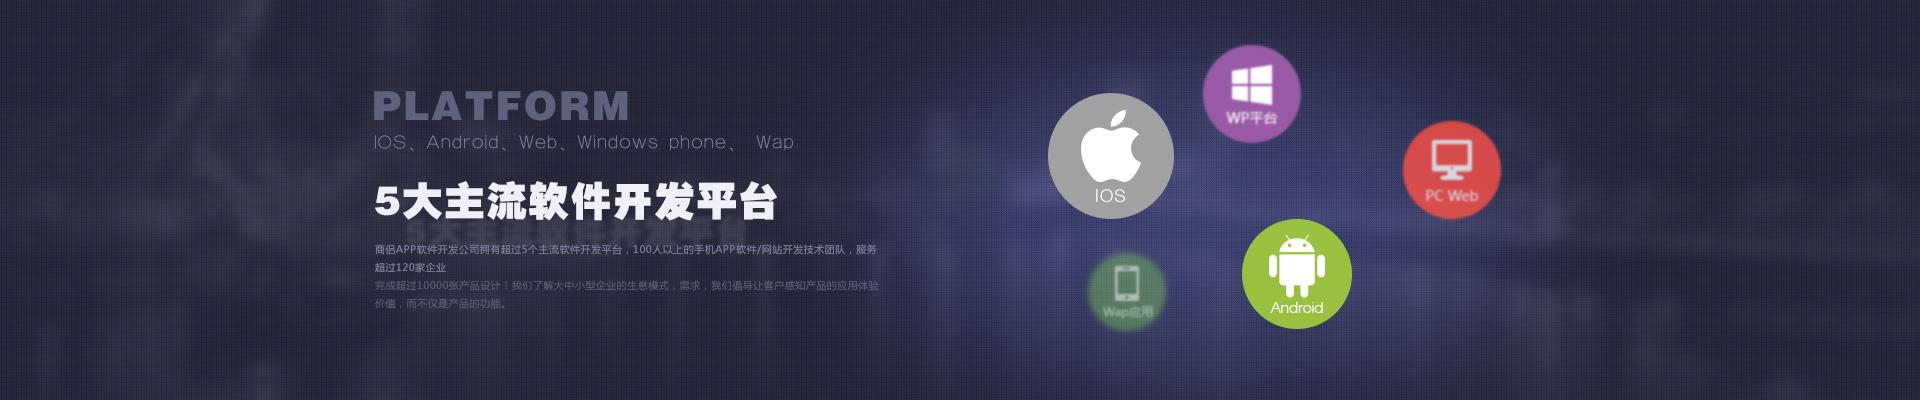 app软件定制开发服务